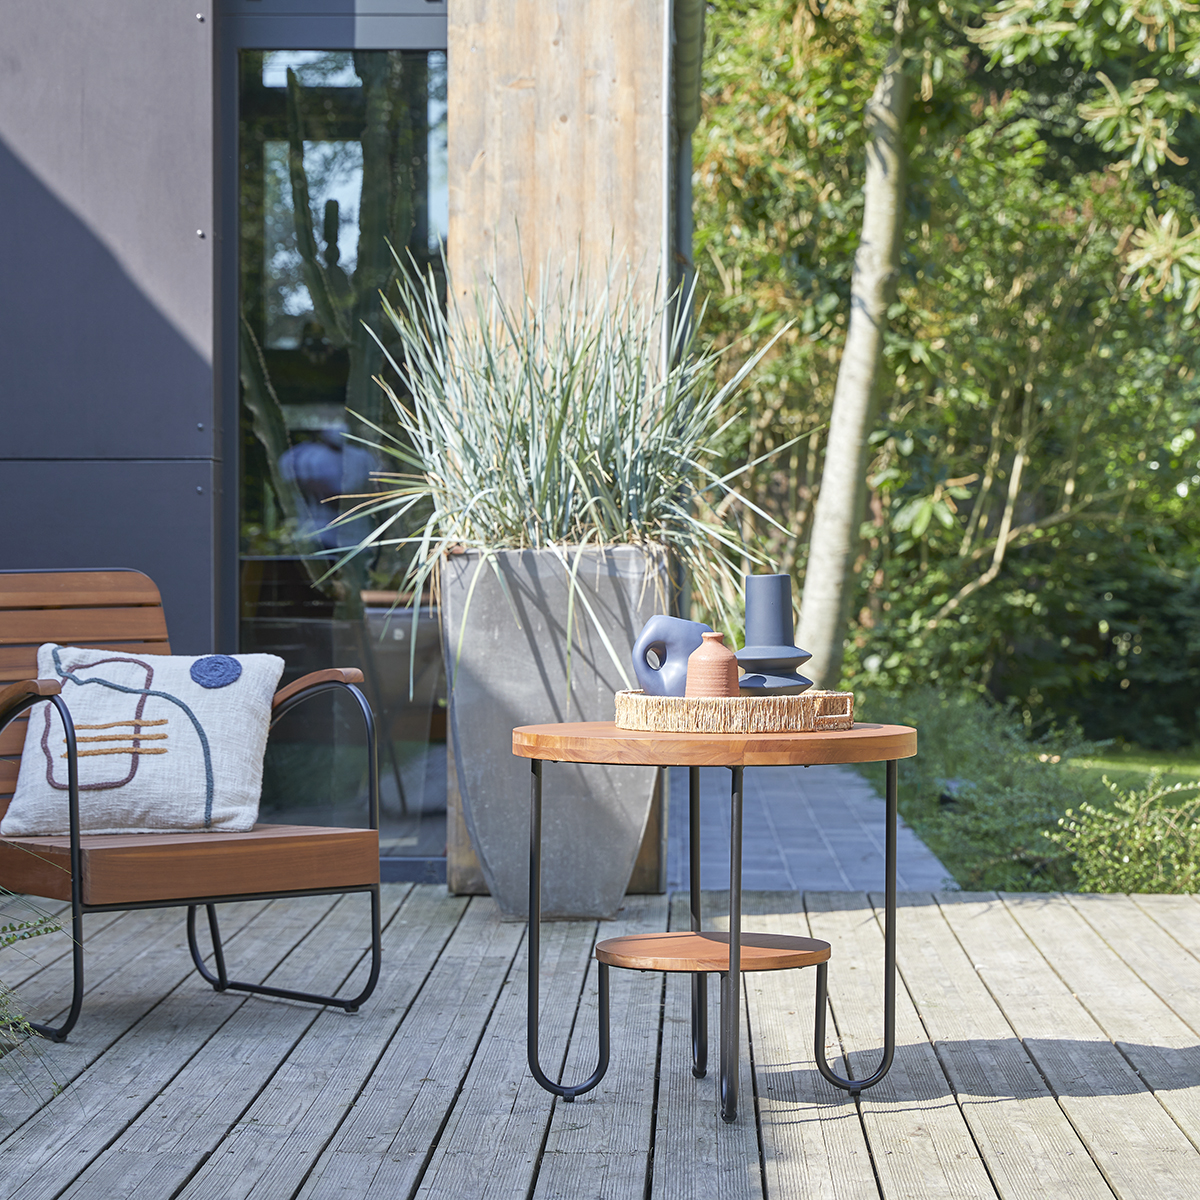 Key Wood solid teak garden Coffee Table